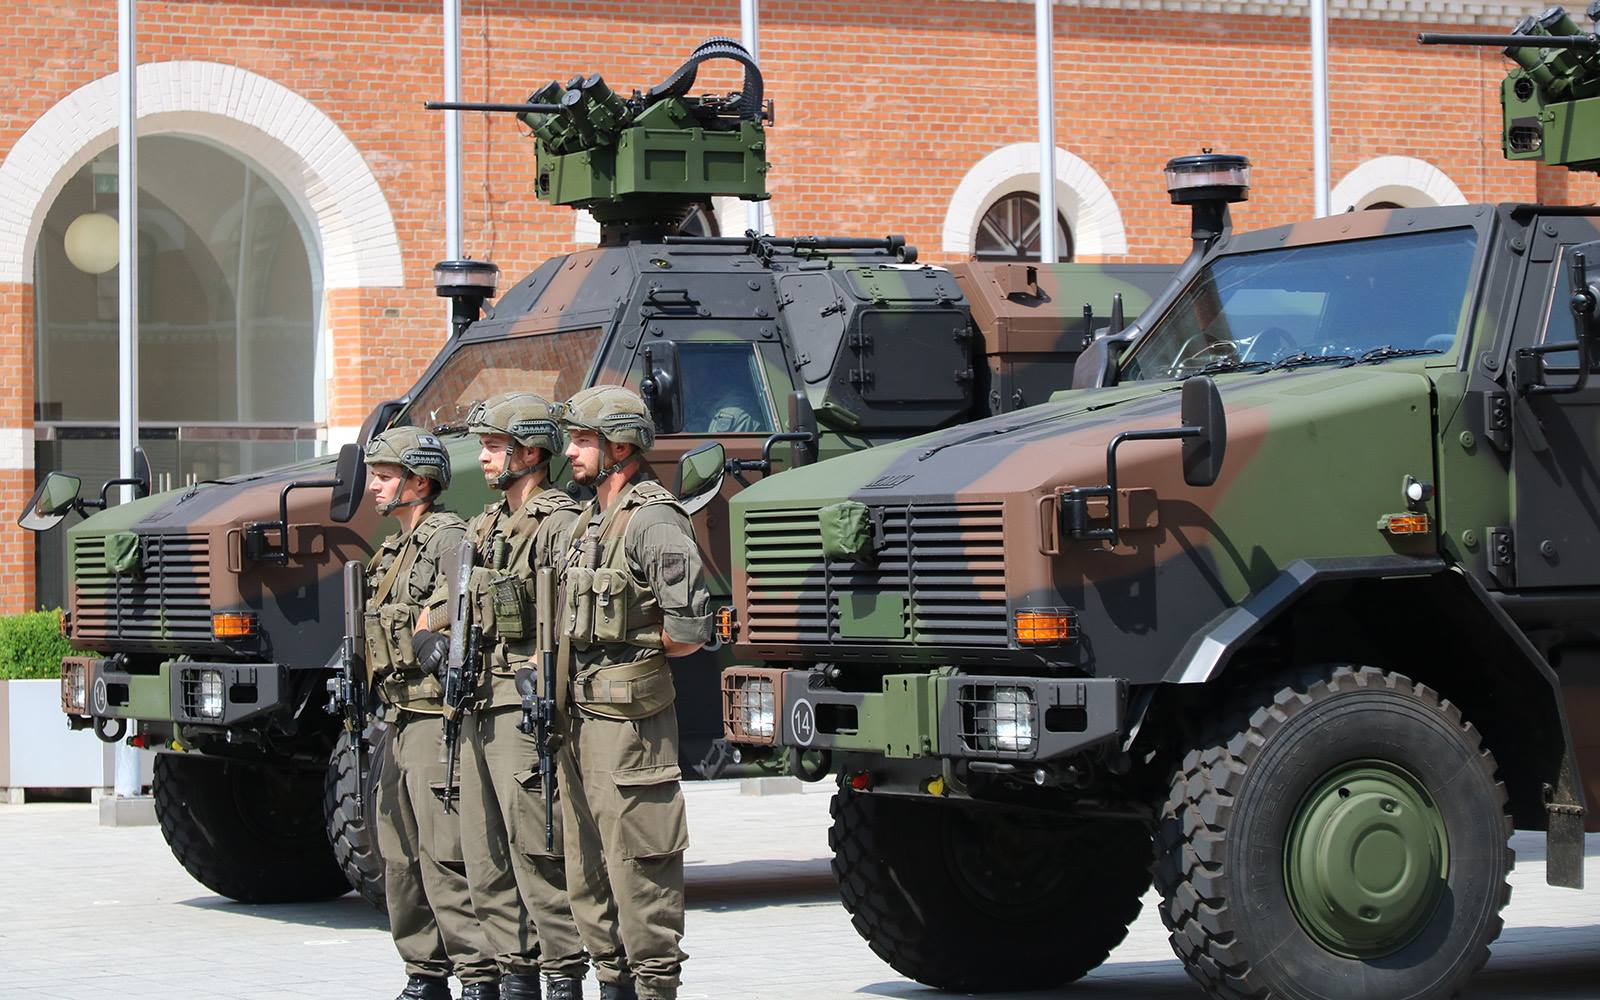 Vorstellung der Version DINGO 2A3 MatE (Materialerhaltung) am 04.06.2018 in der Rossauer Kaserne © Bundesheer